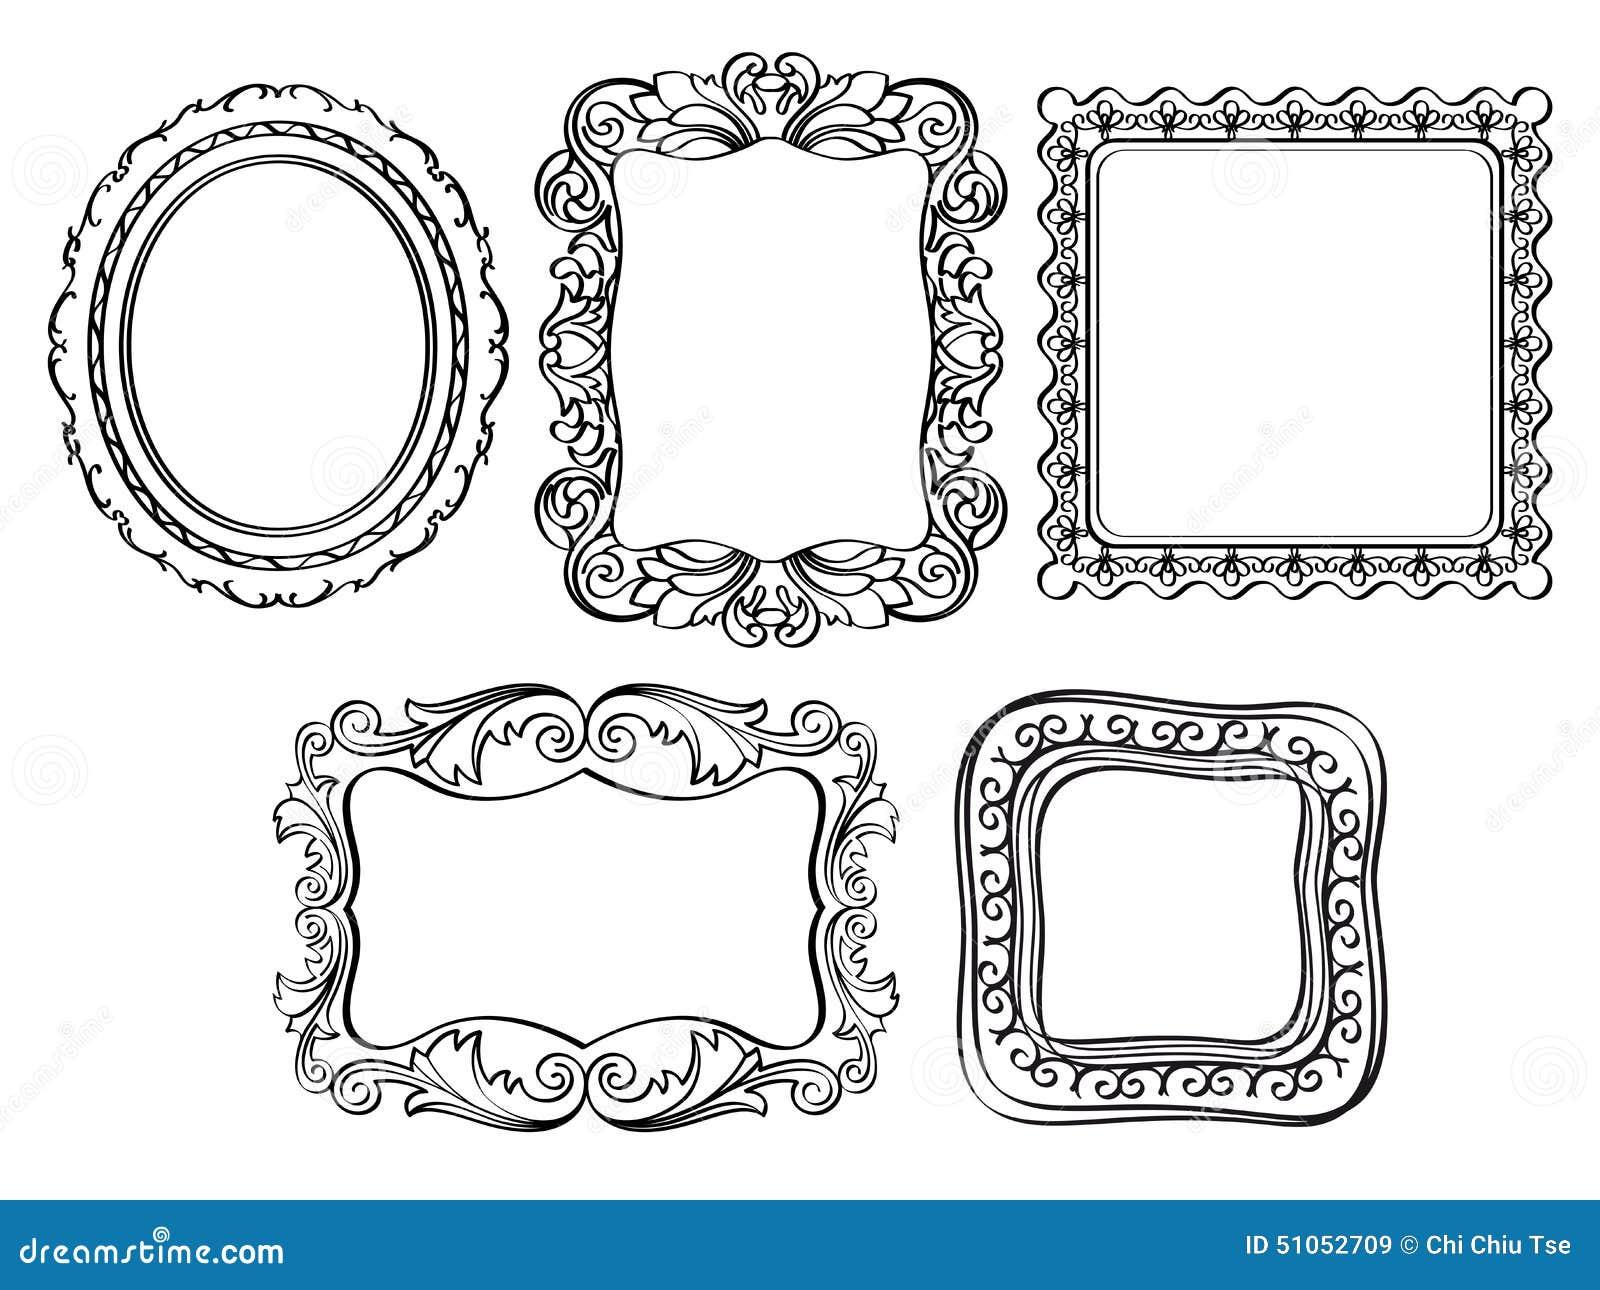 Line Art Frames : Elegant ornate frames stock illustration image